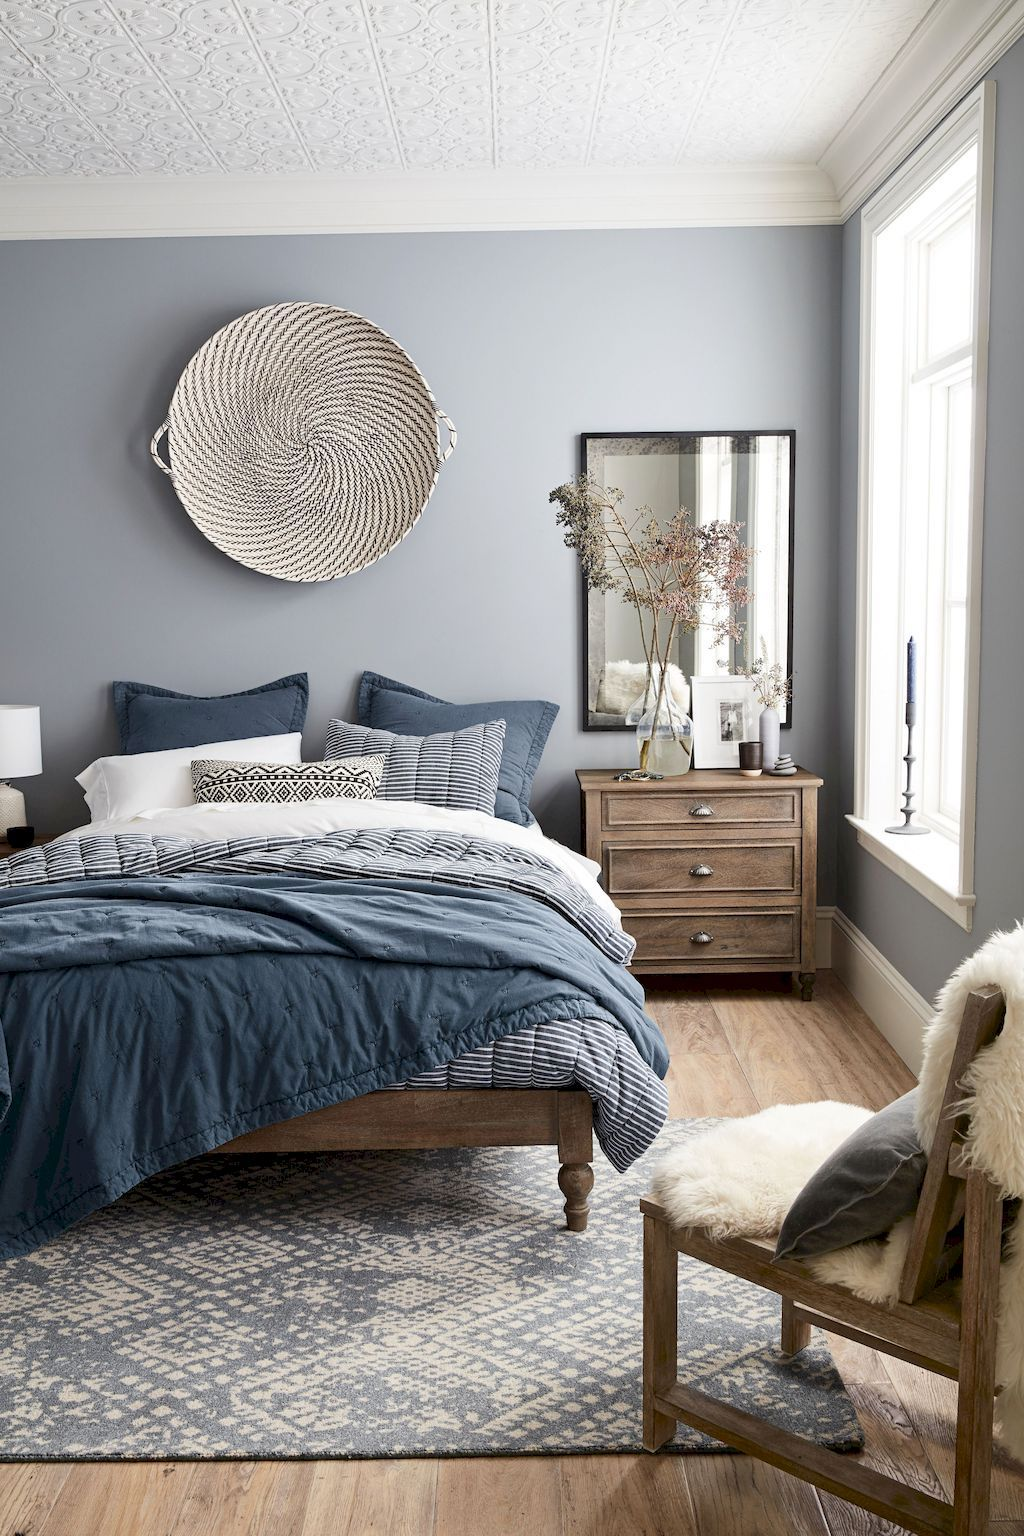 Minimalist Master Bedroom Ideas 75 Master Bedroom Interior